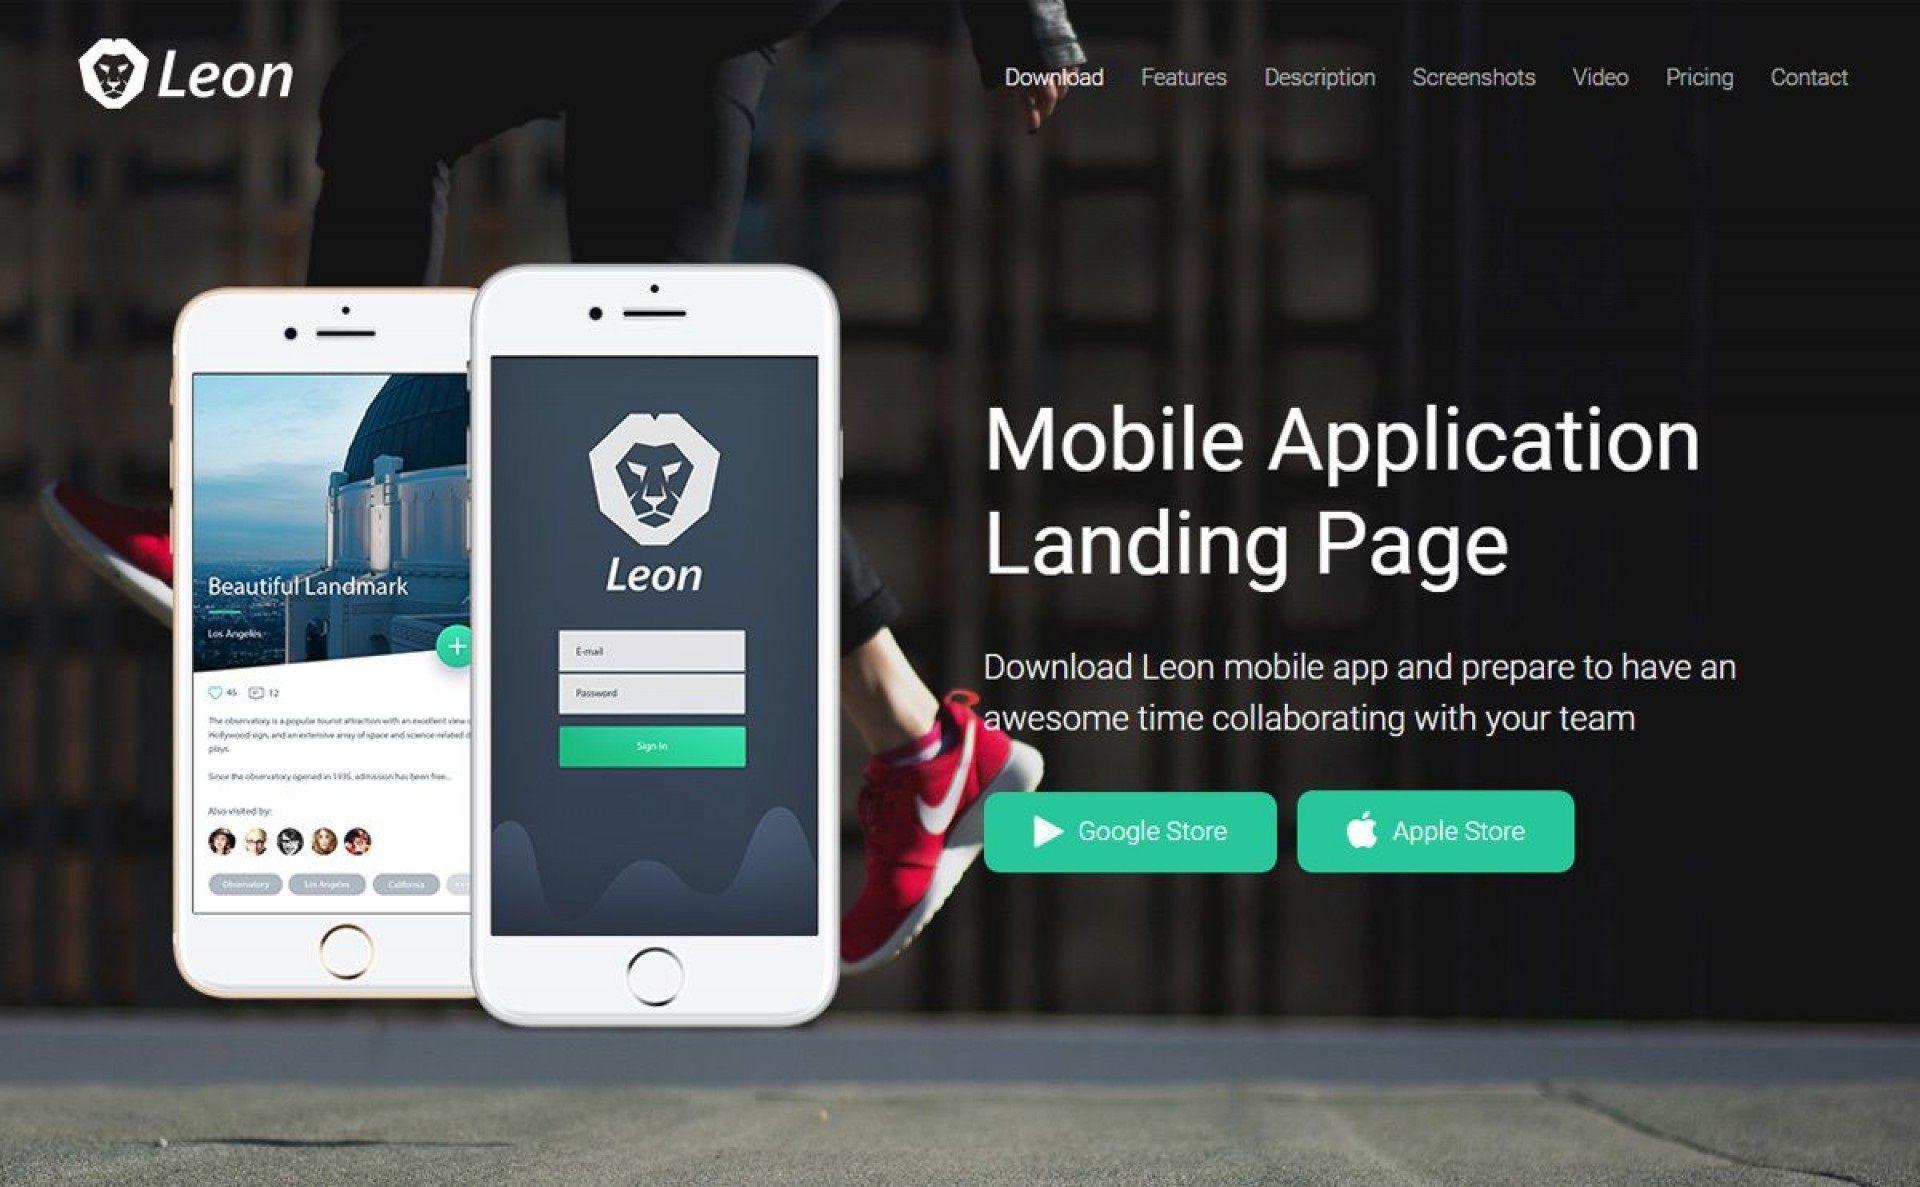 003 Frightening Csvape Esponsive Mobile App Landing Page Html Template Free Download Image  Csvape-responsive-mobile-app-landing-page-html-template1920